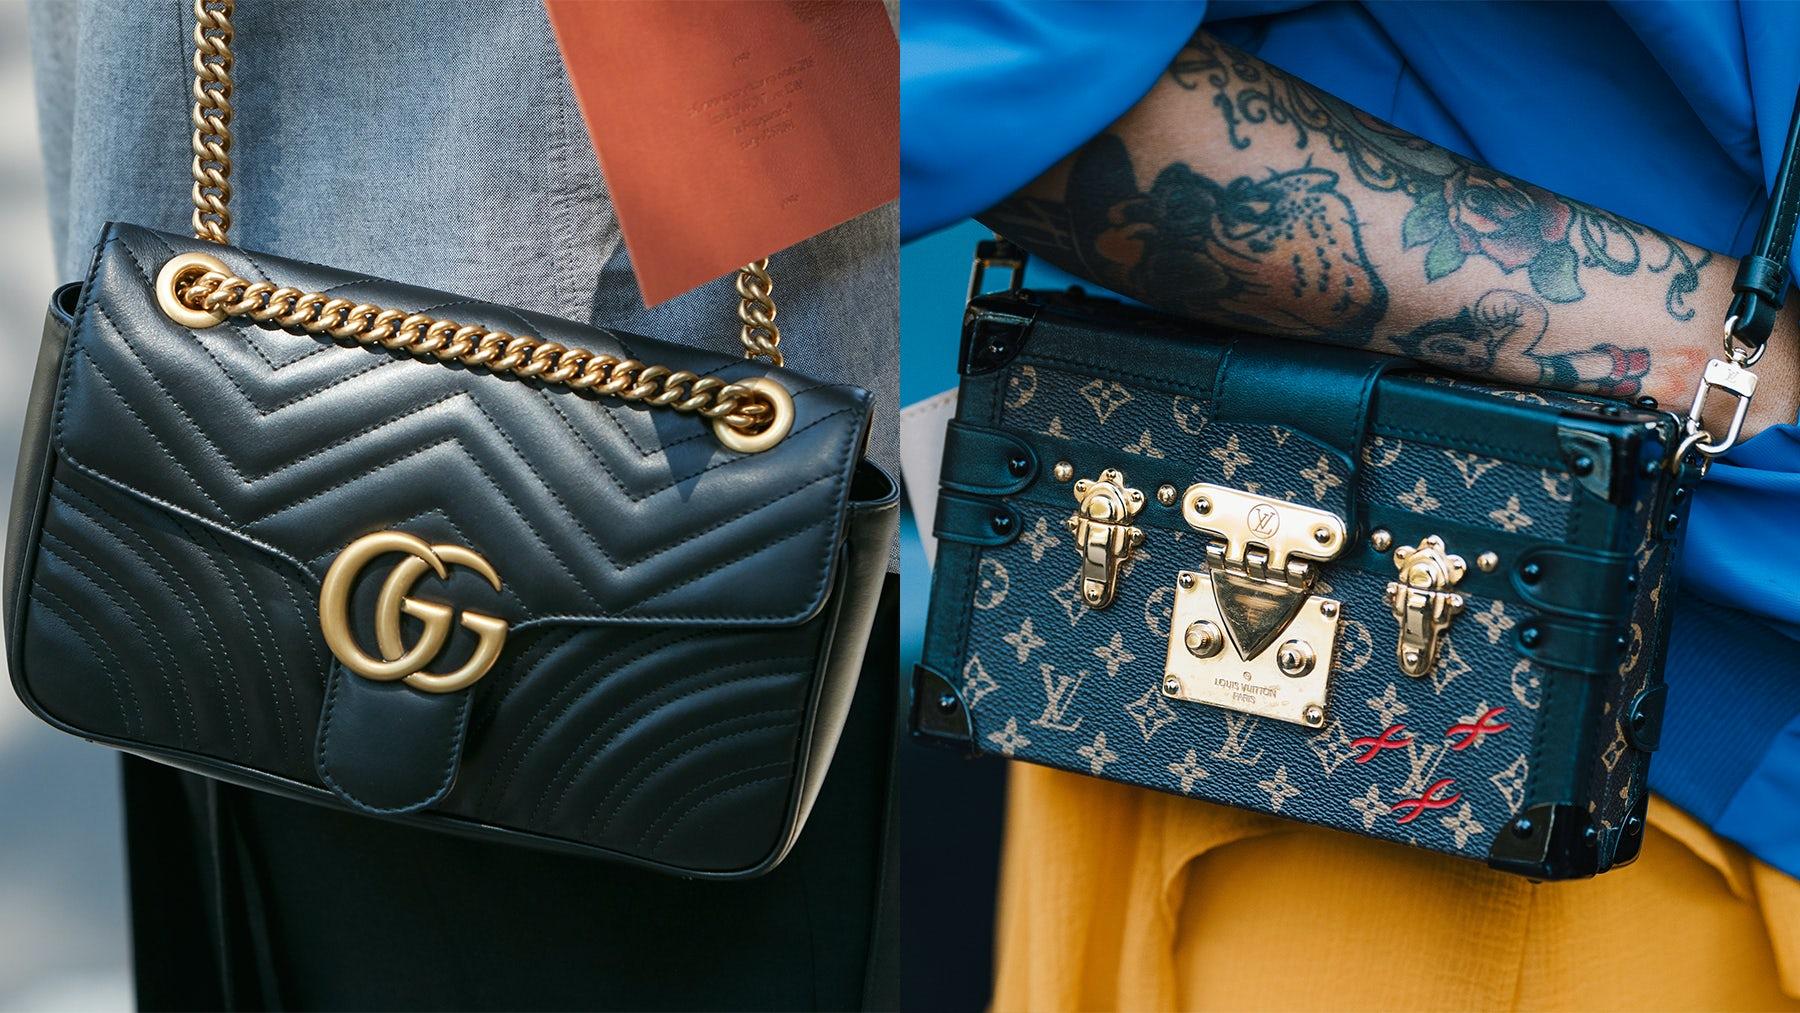 Gucci and Louis Vuitton handbags | Source: Shutterstock